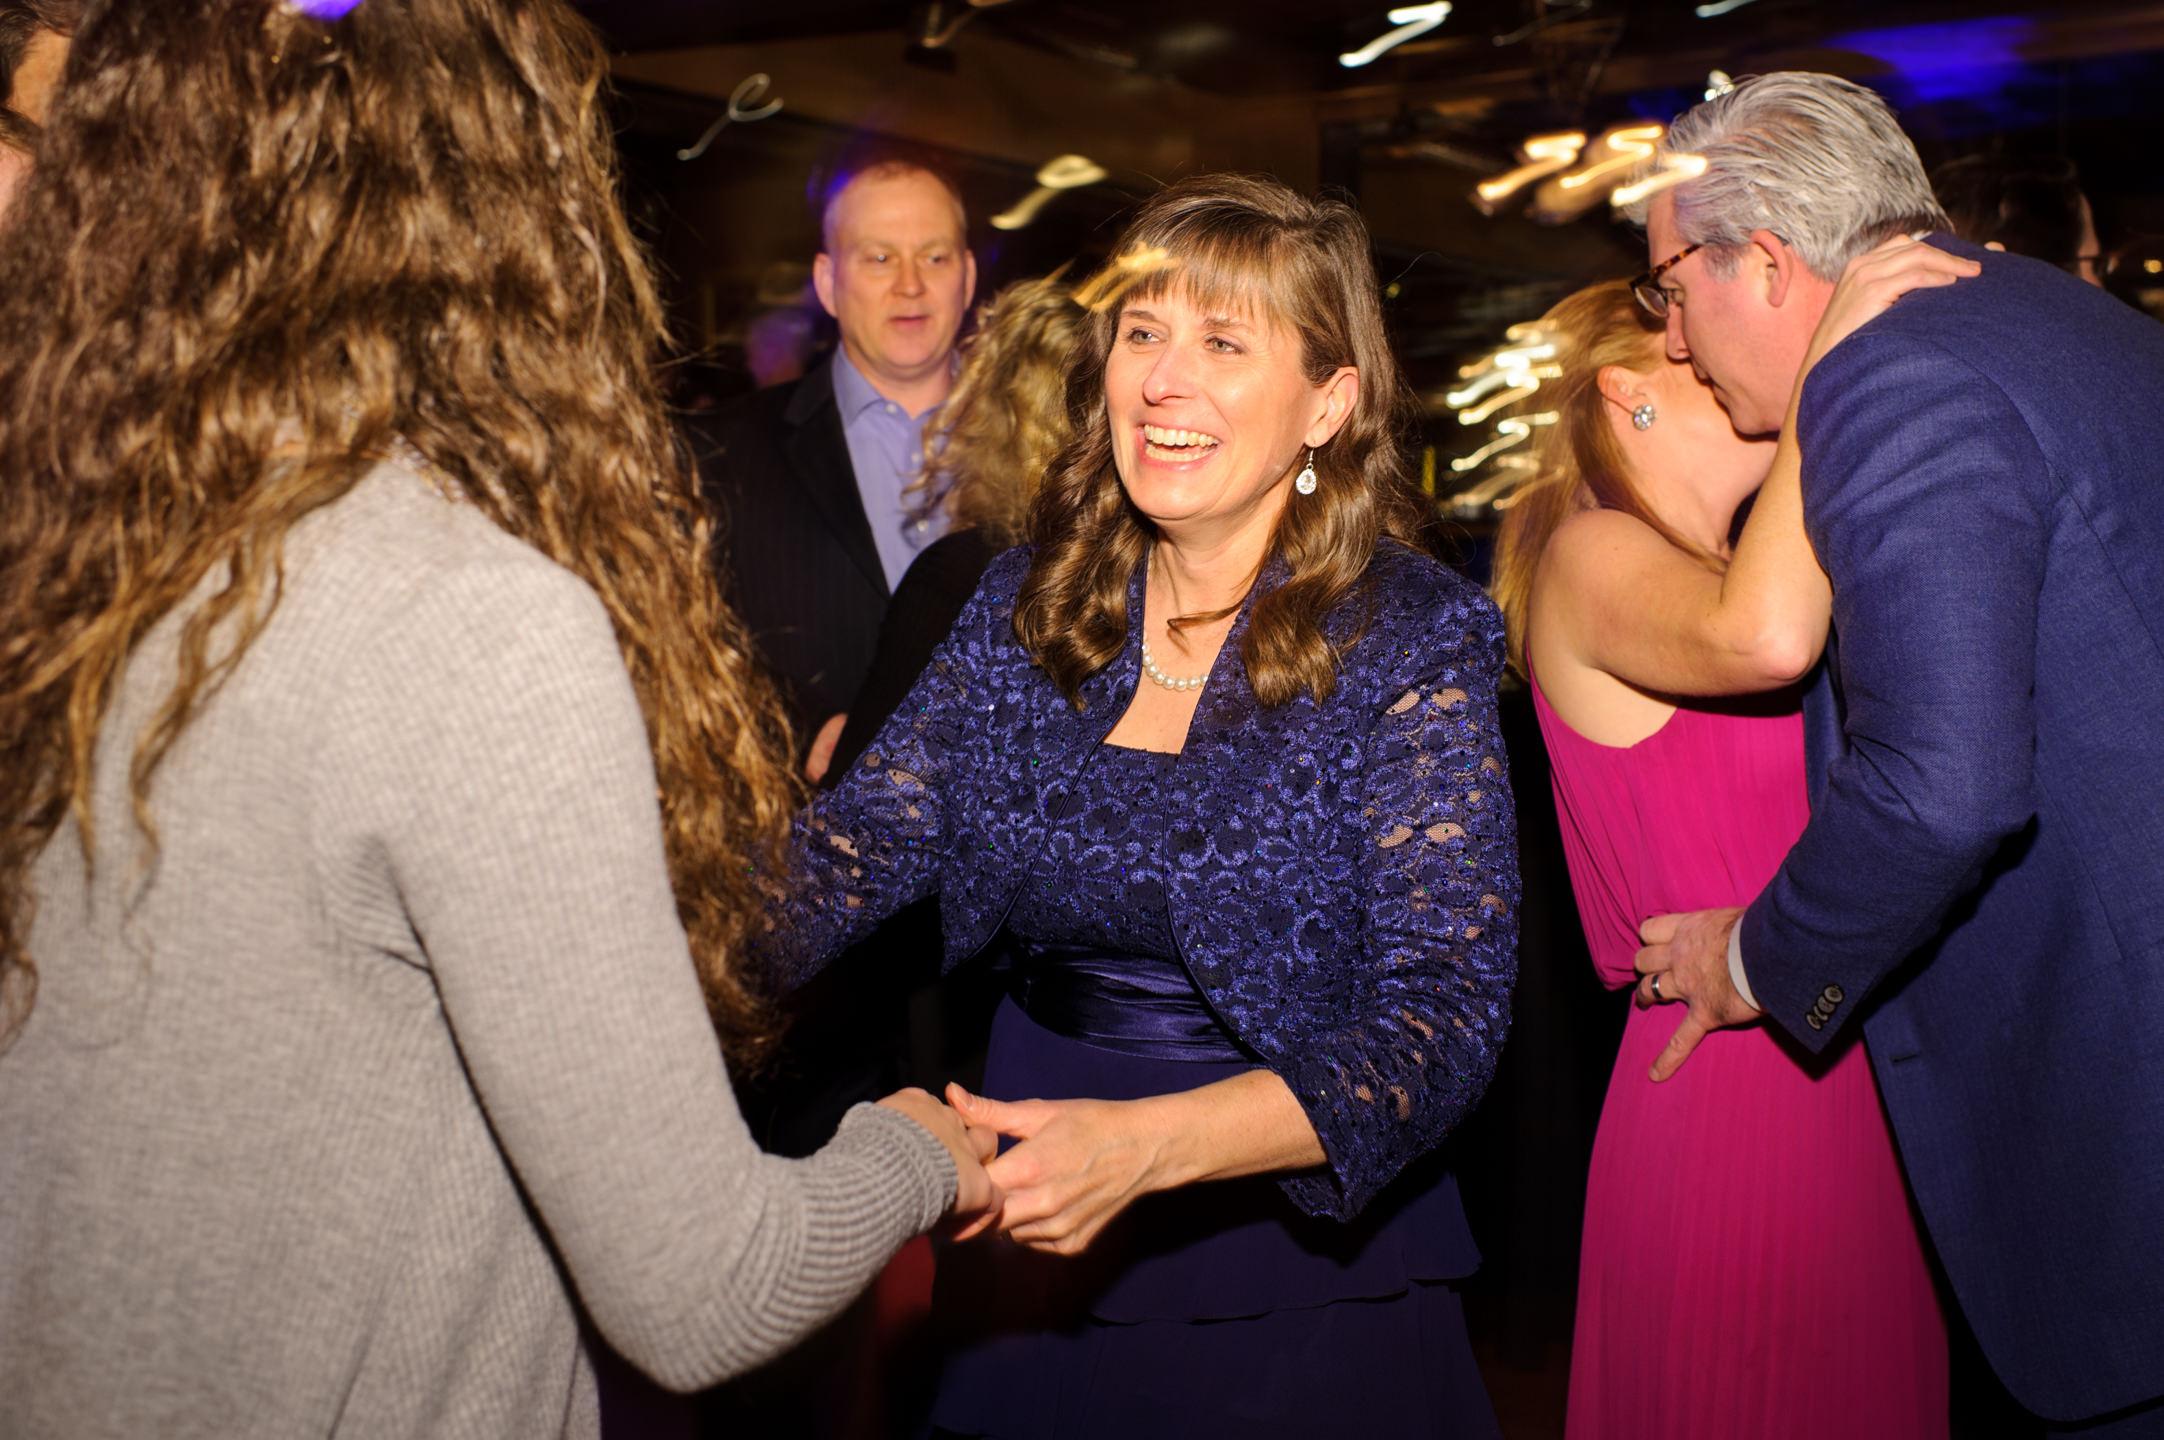 Wedding Guest Dances at Lake Union Cafe